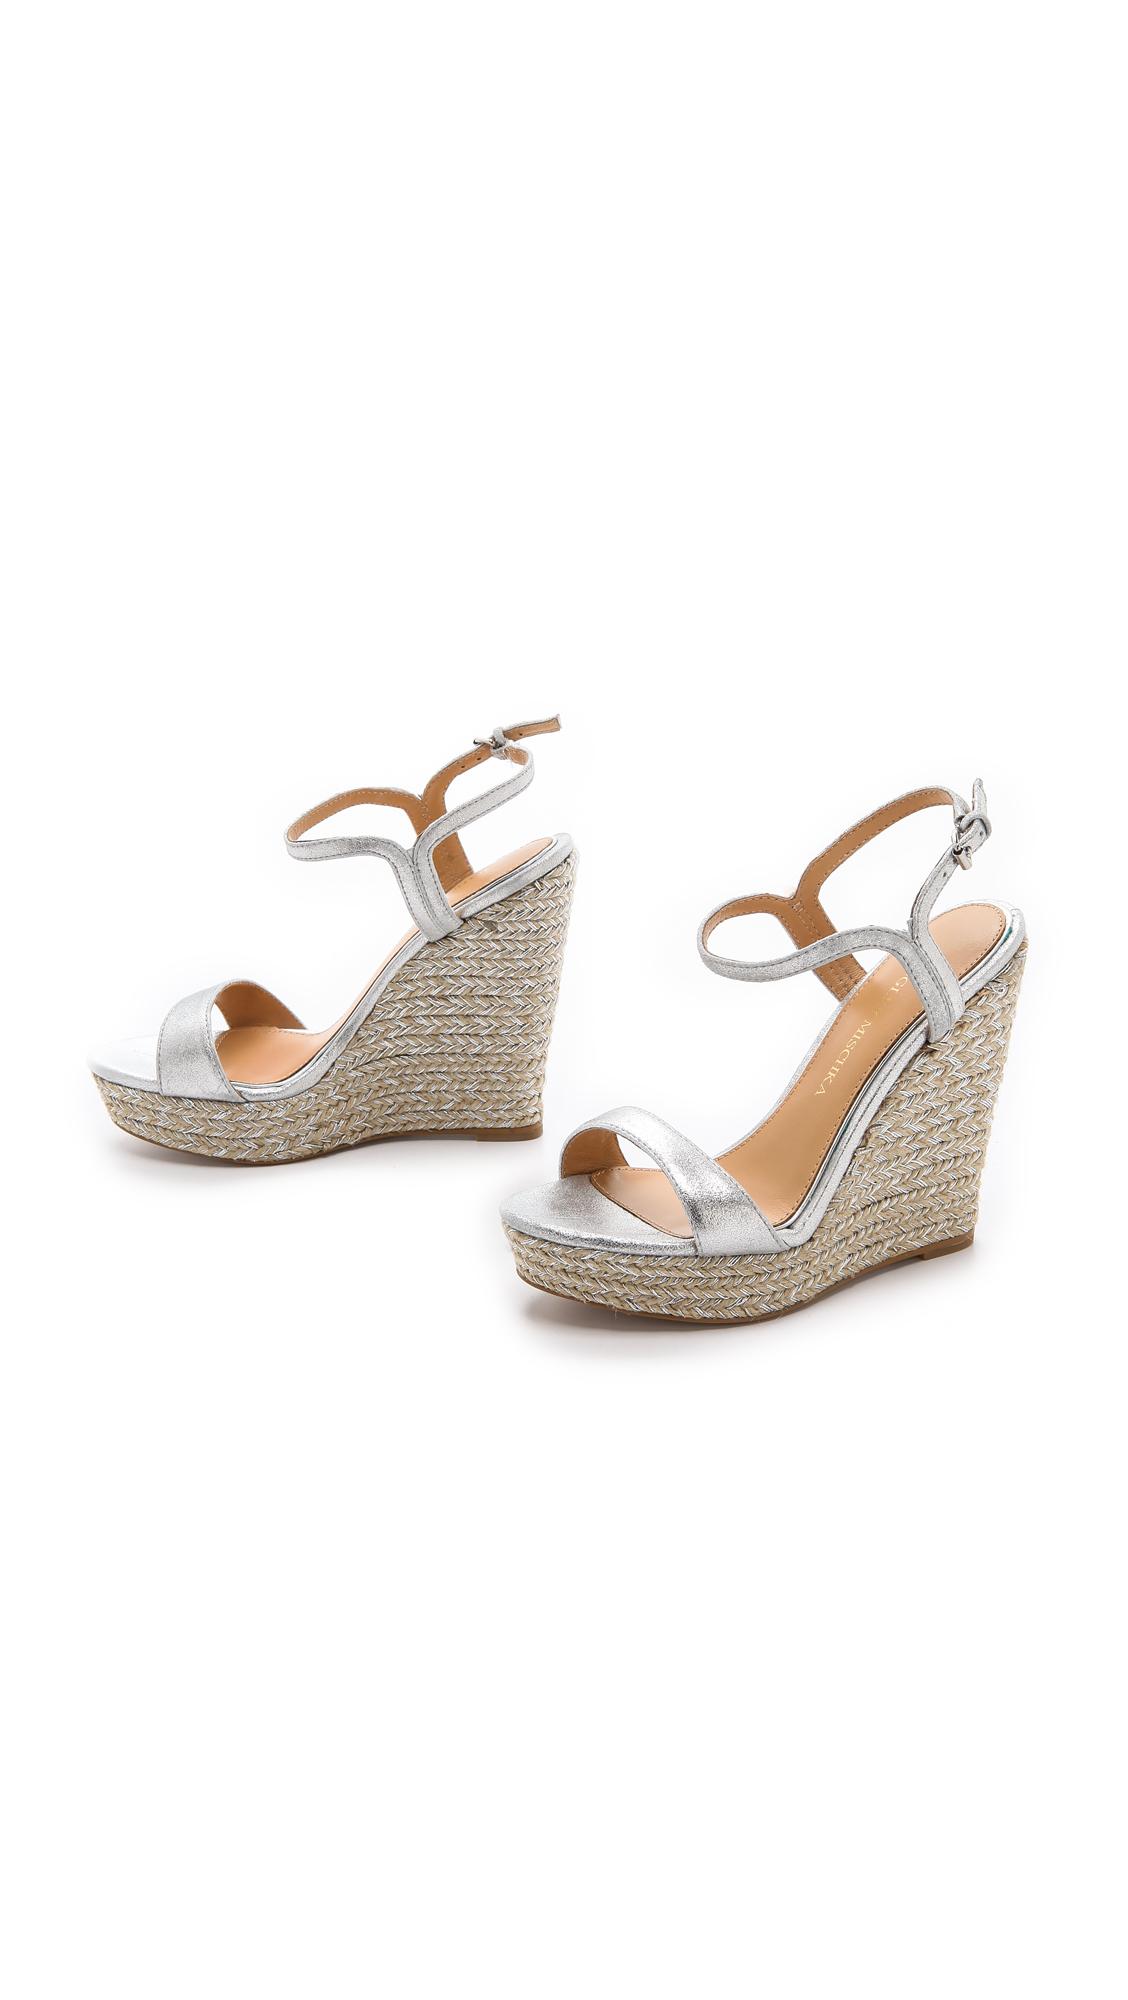 167ca9cede9 Badgley Mischka Metallic Kleo Espadrille Wedge Sandals